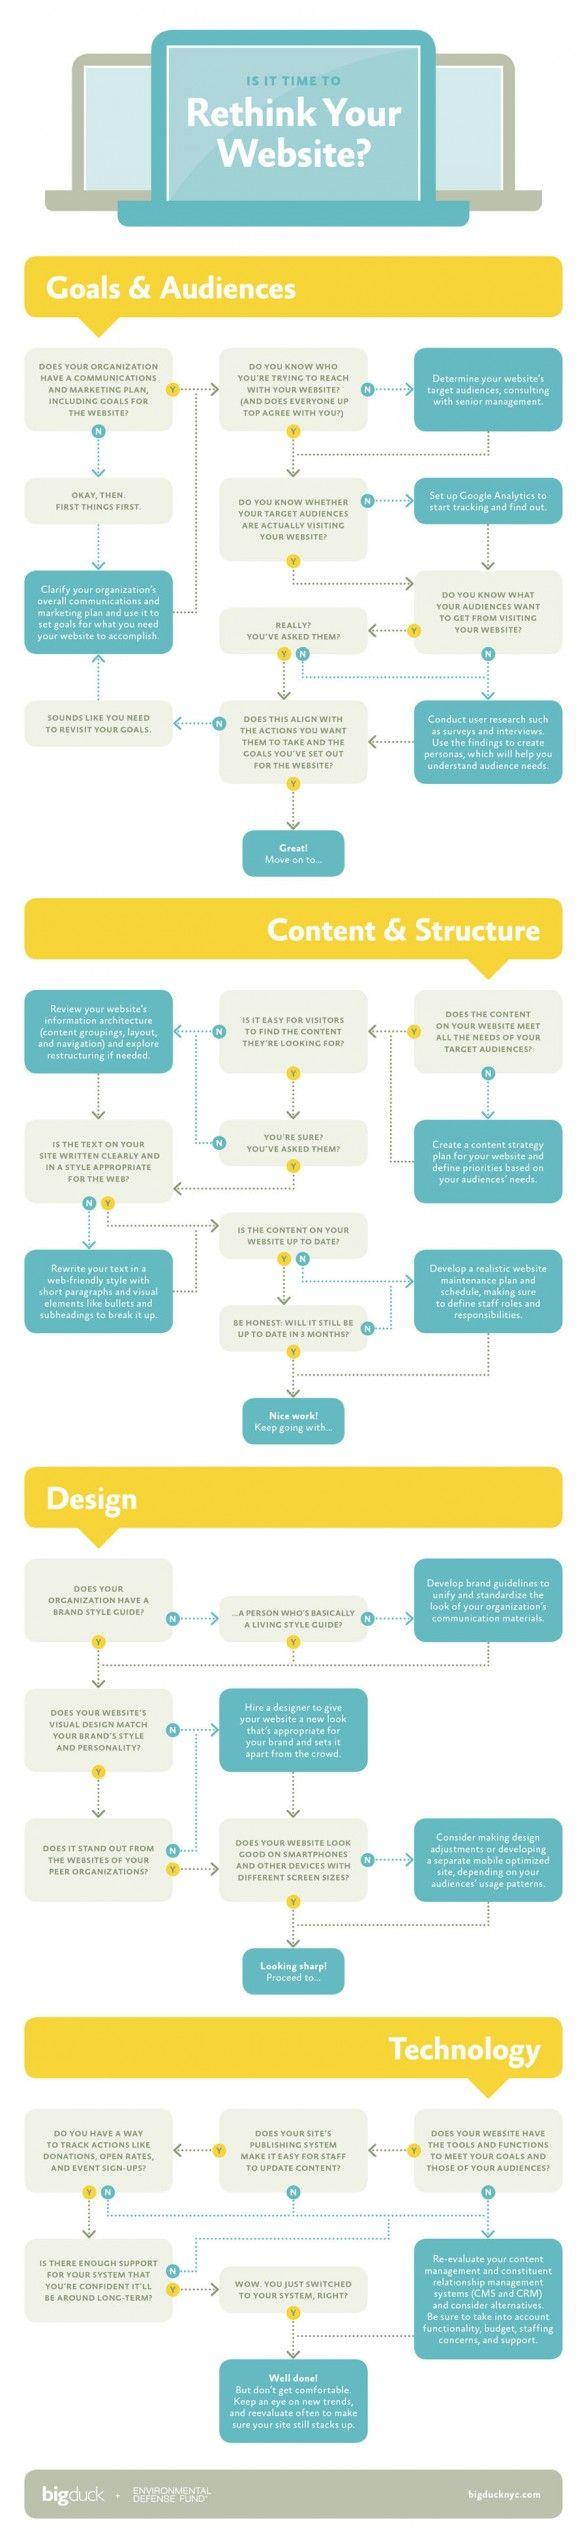 Rethink your website   design   authoring   blogging   infographic   ram2013